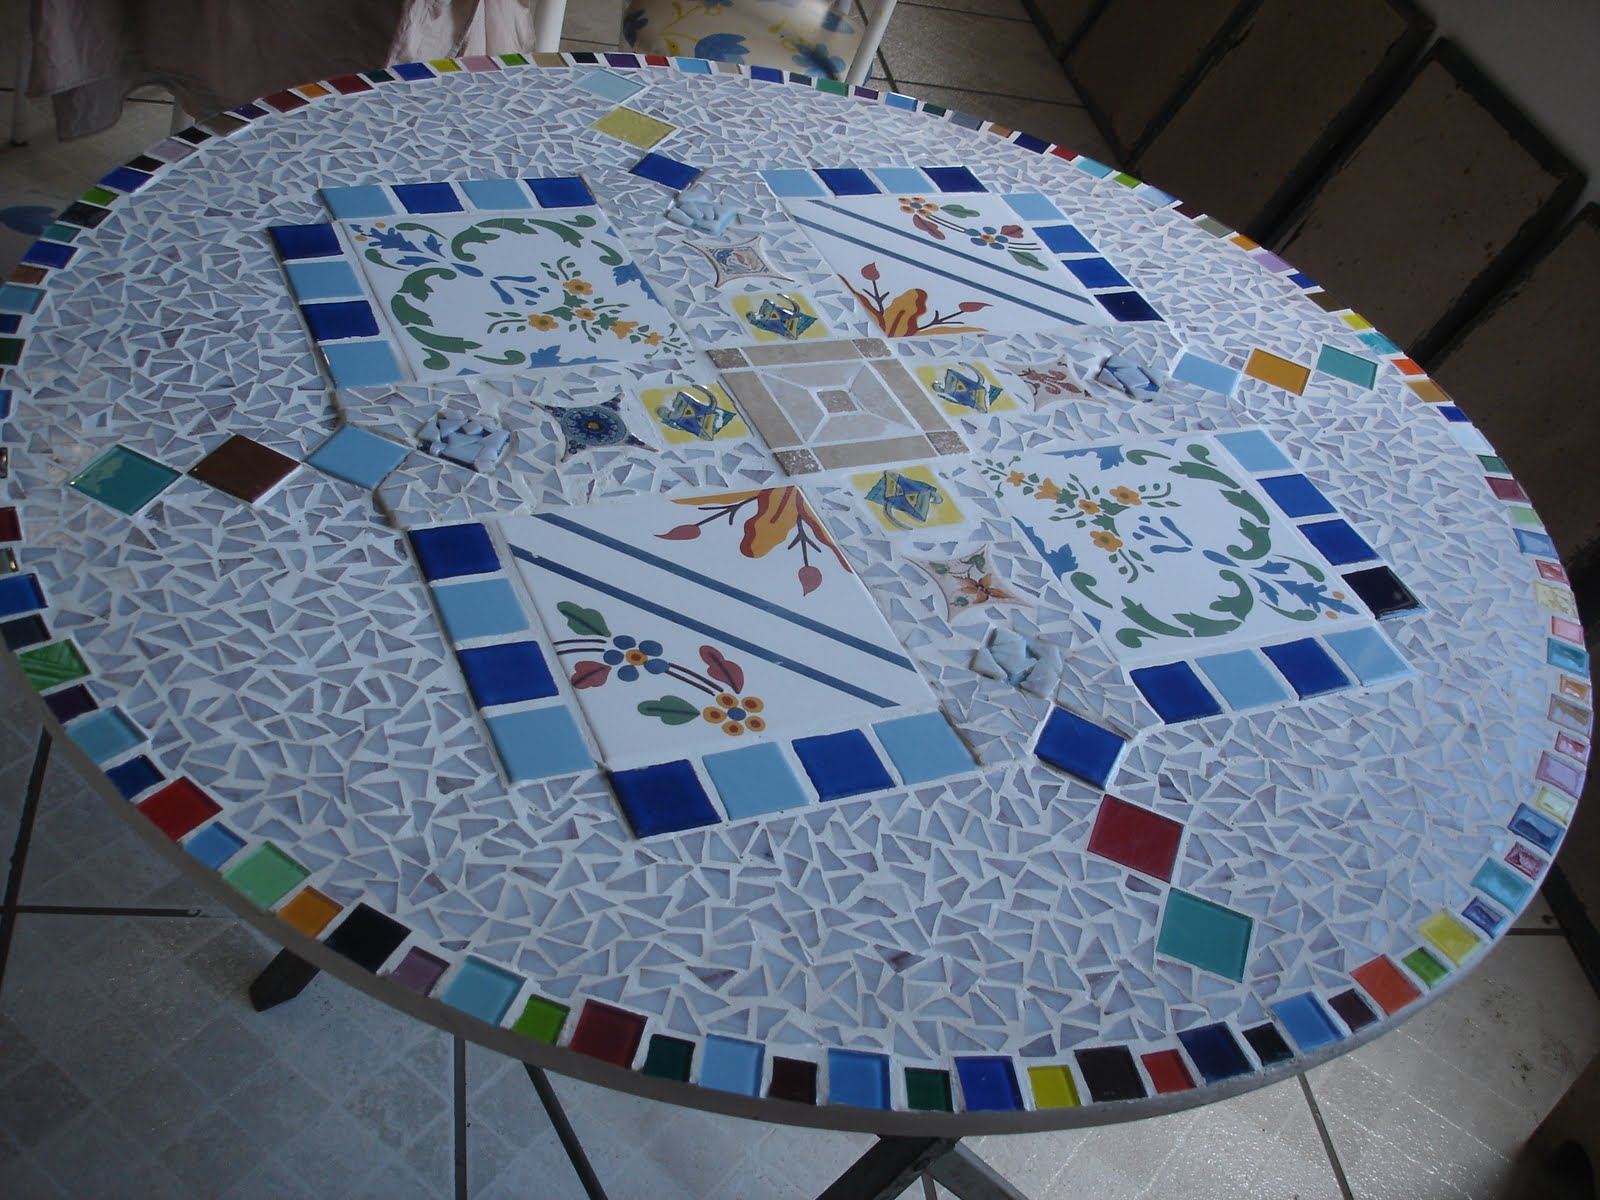 cris gasparoto mesa de mosaico e azulejos